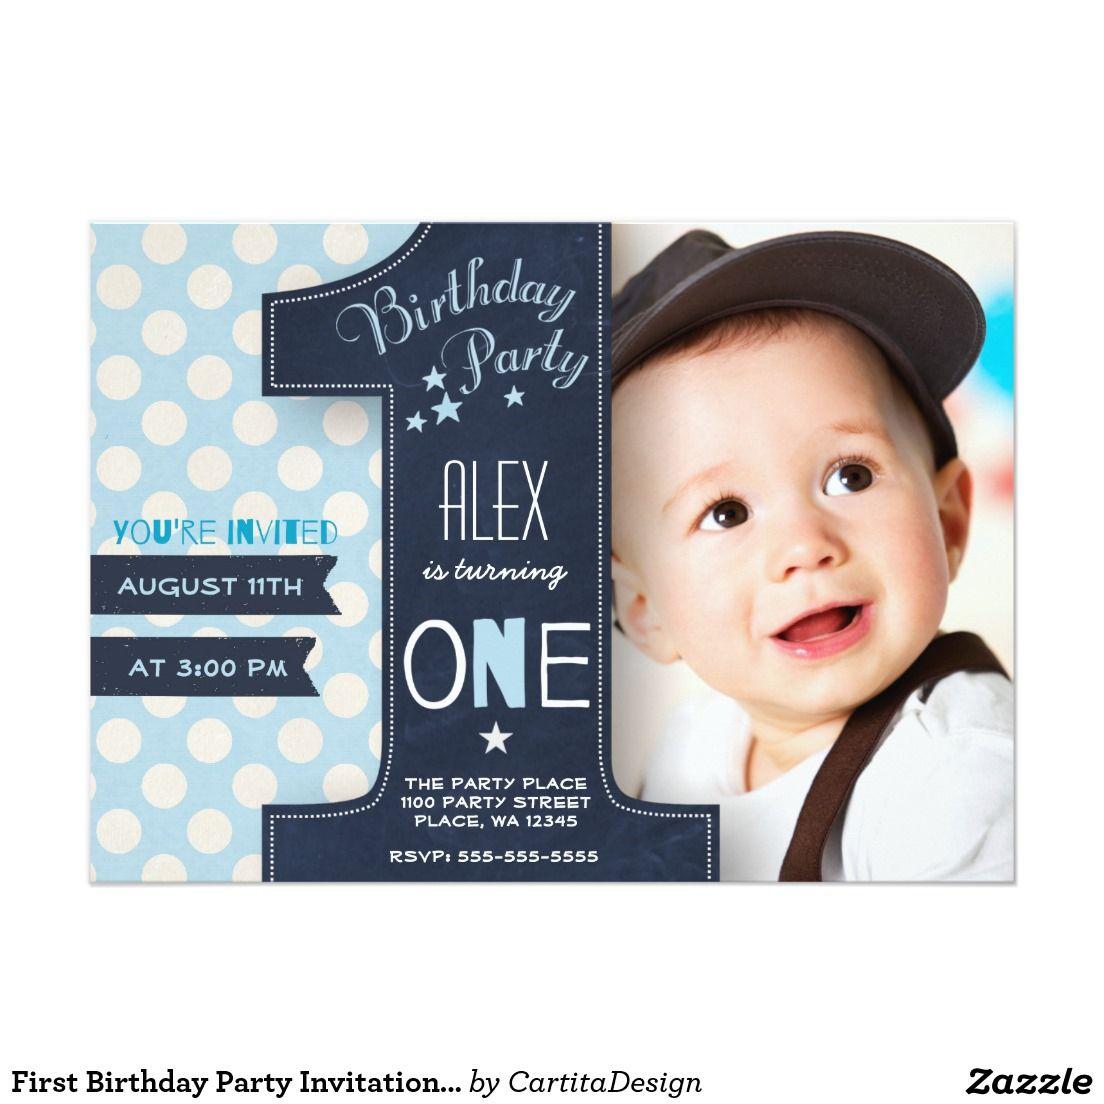 First birthday party invitation boy chalkboard party invitations first birthday party invitation boy chalkboard filmwisefo Images